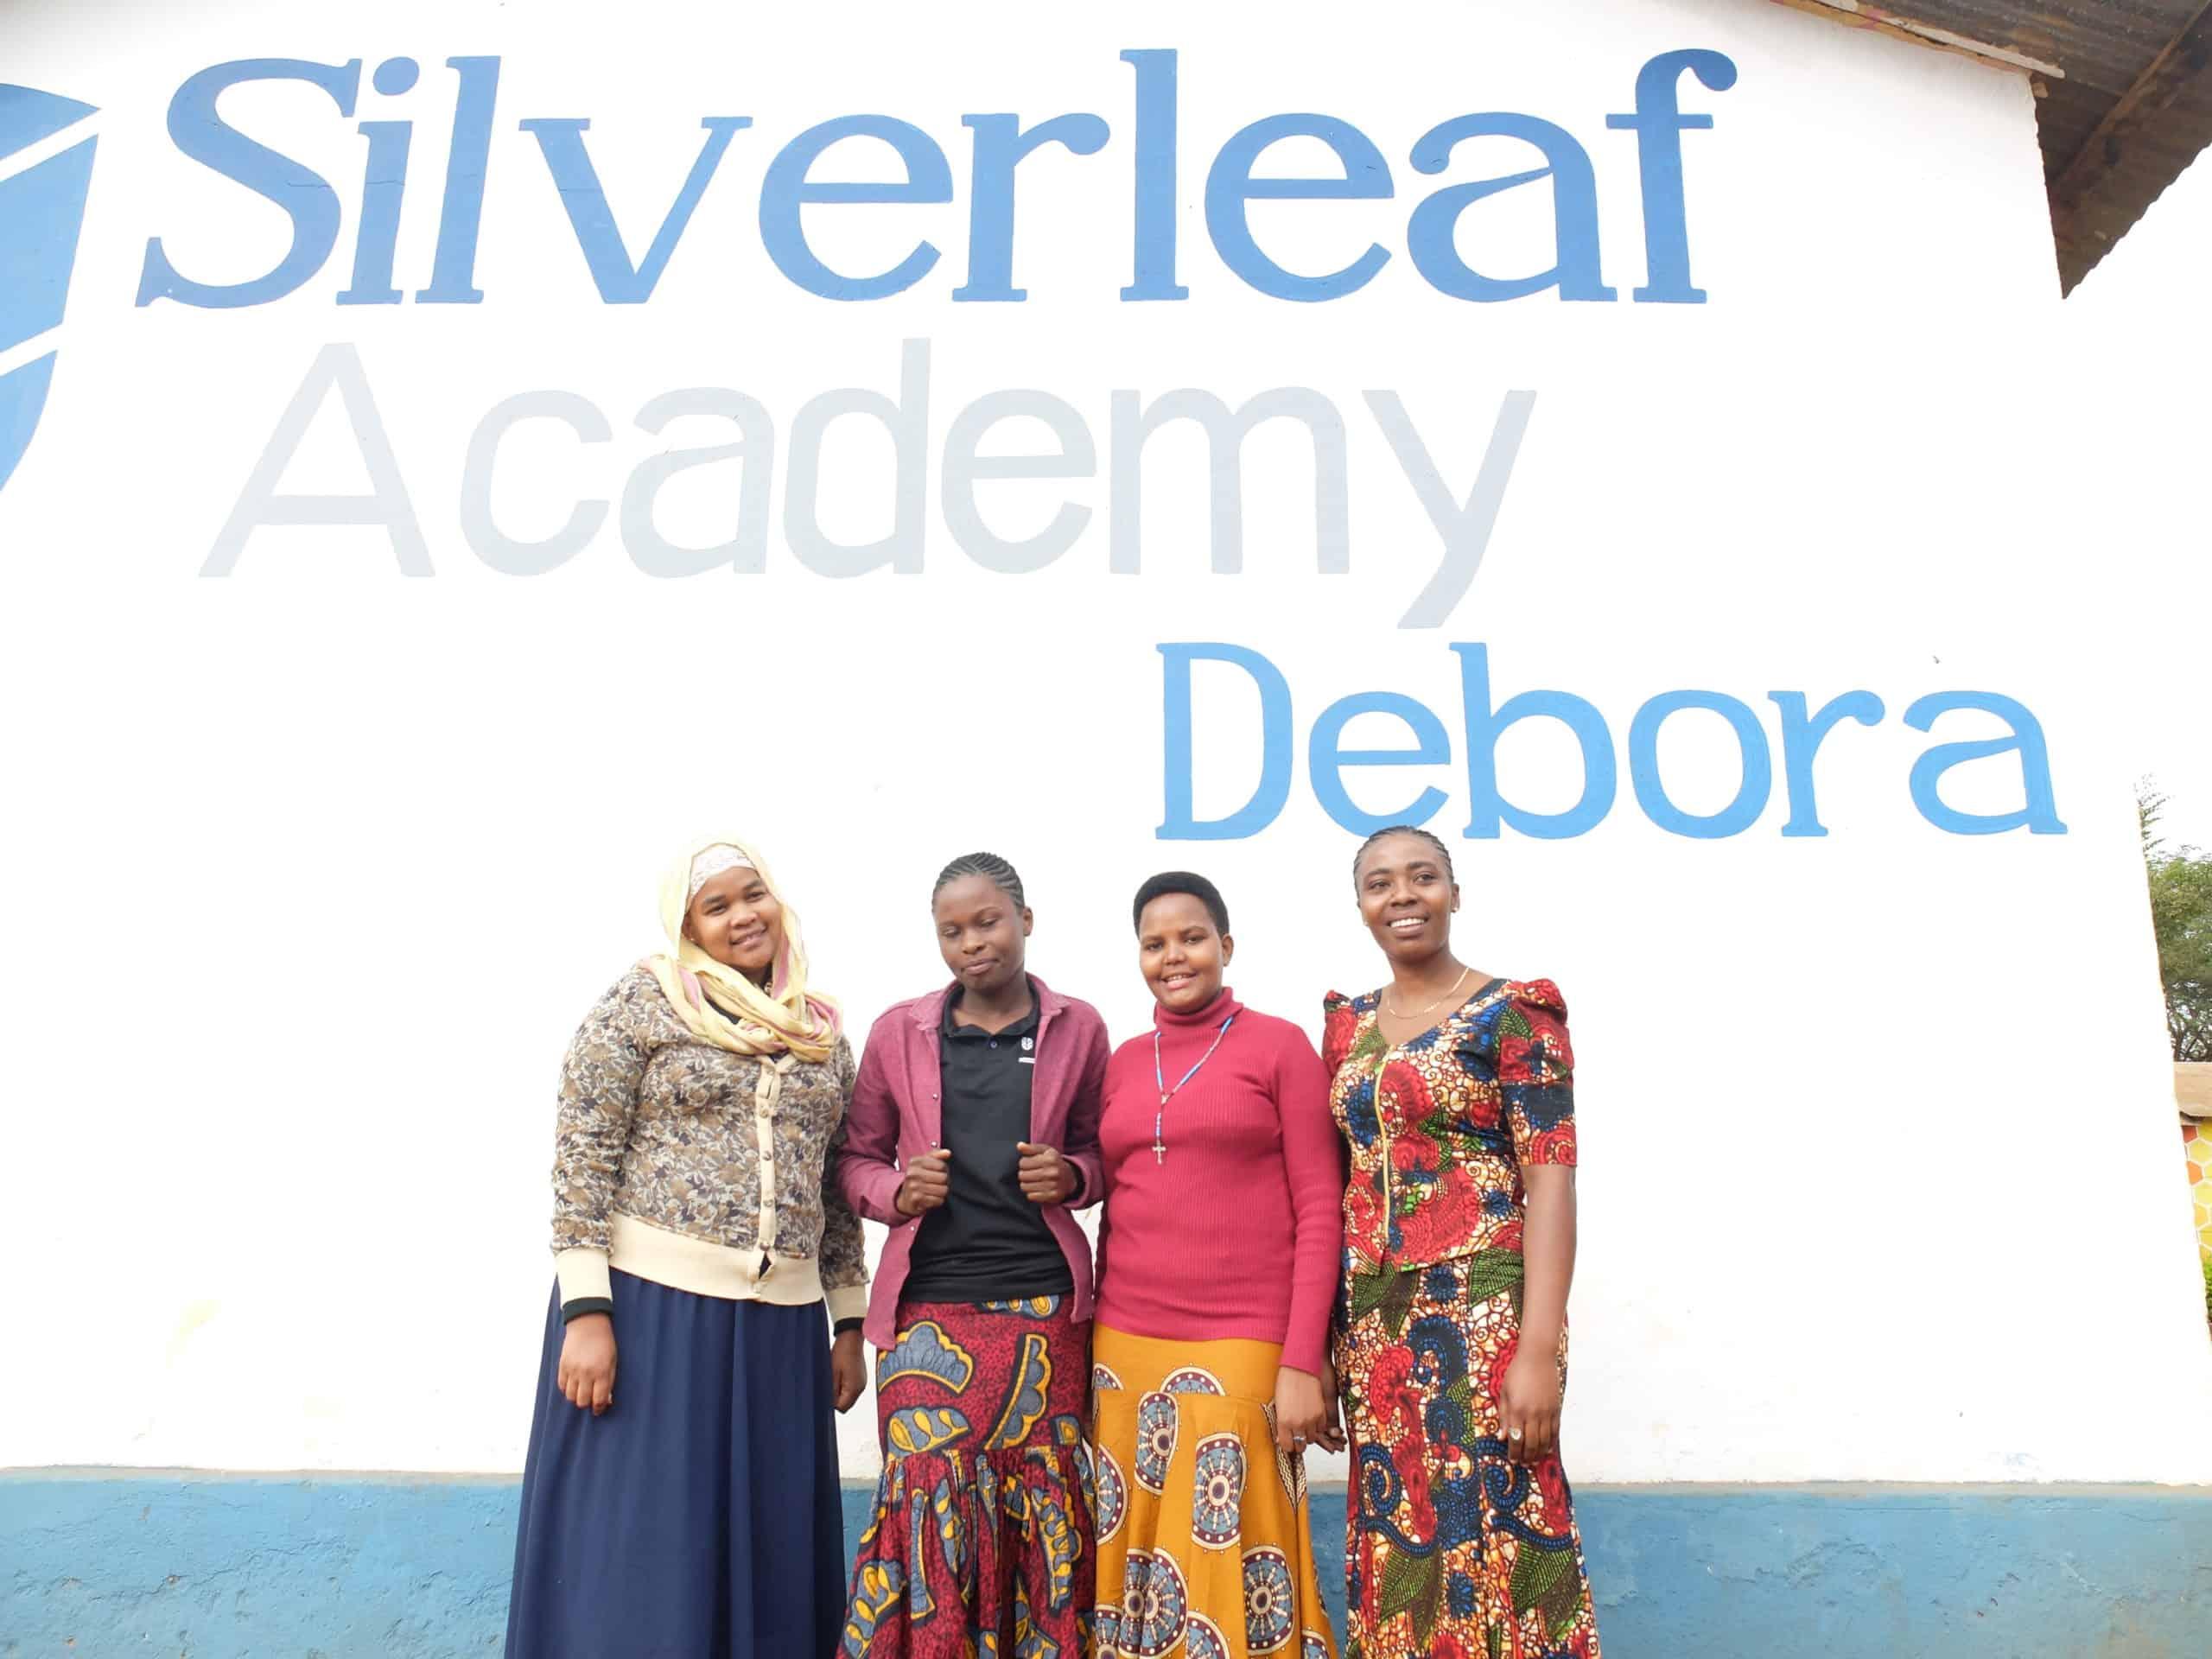 Graduates employed at Silverleaf Academy